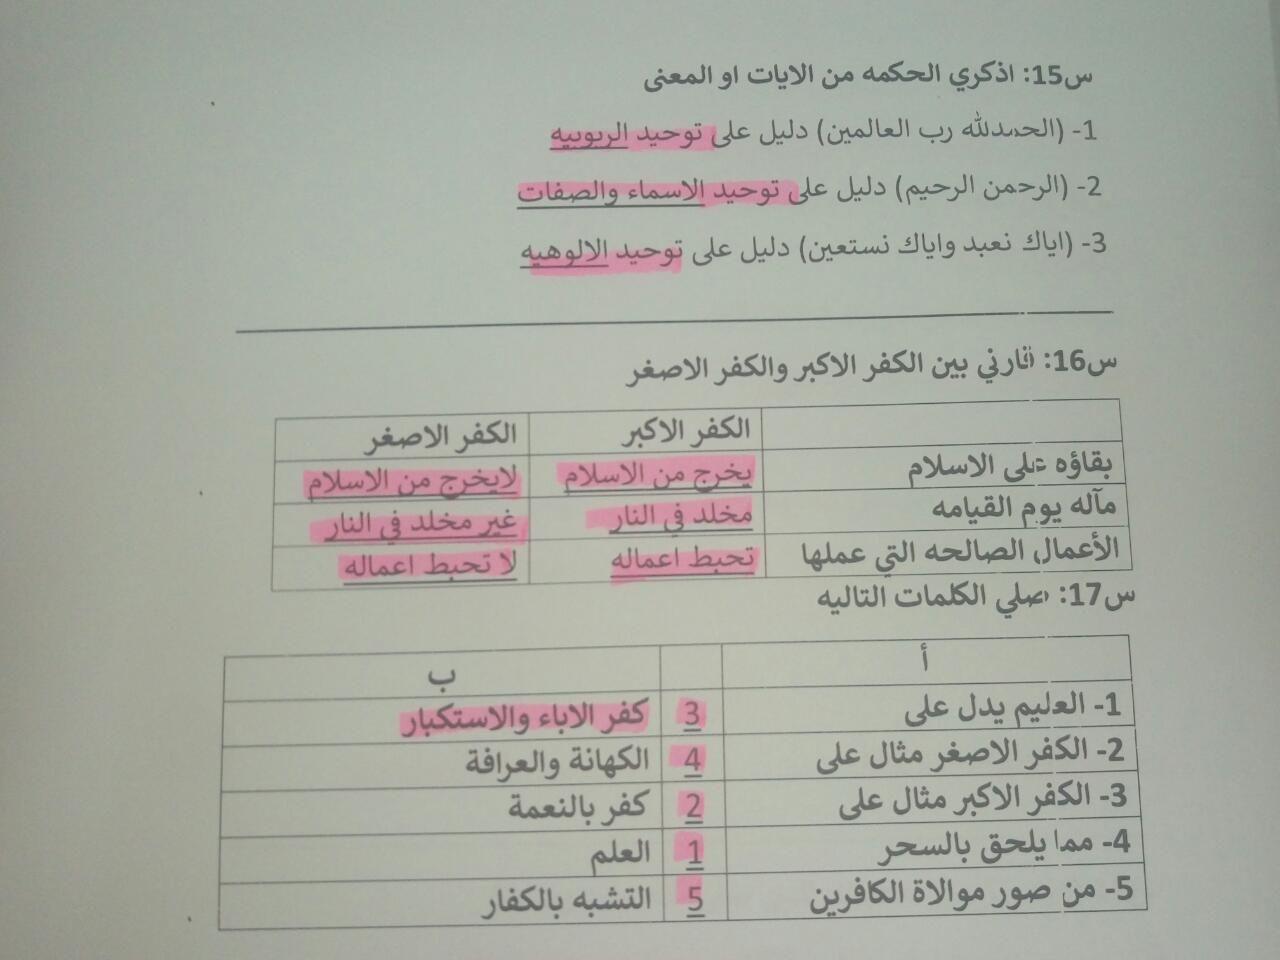 Pin By Jowanaalhoshan On Arabic Words Arabic Words Words Journal